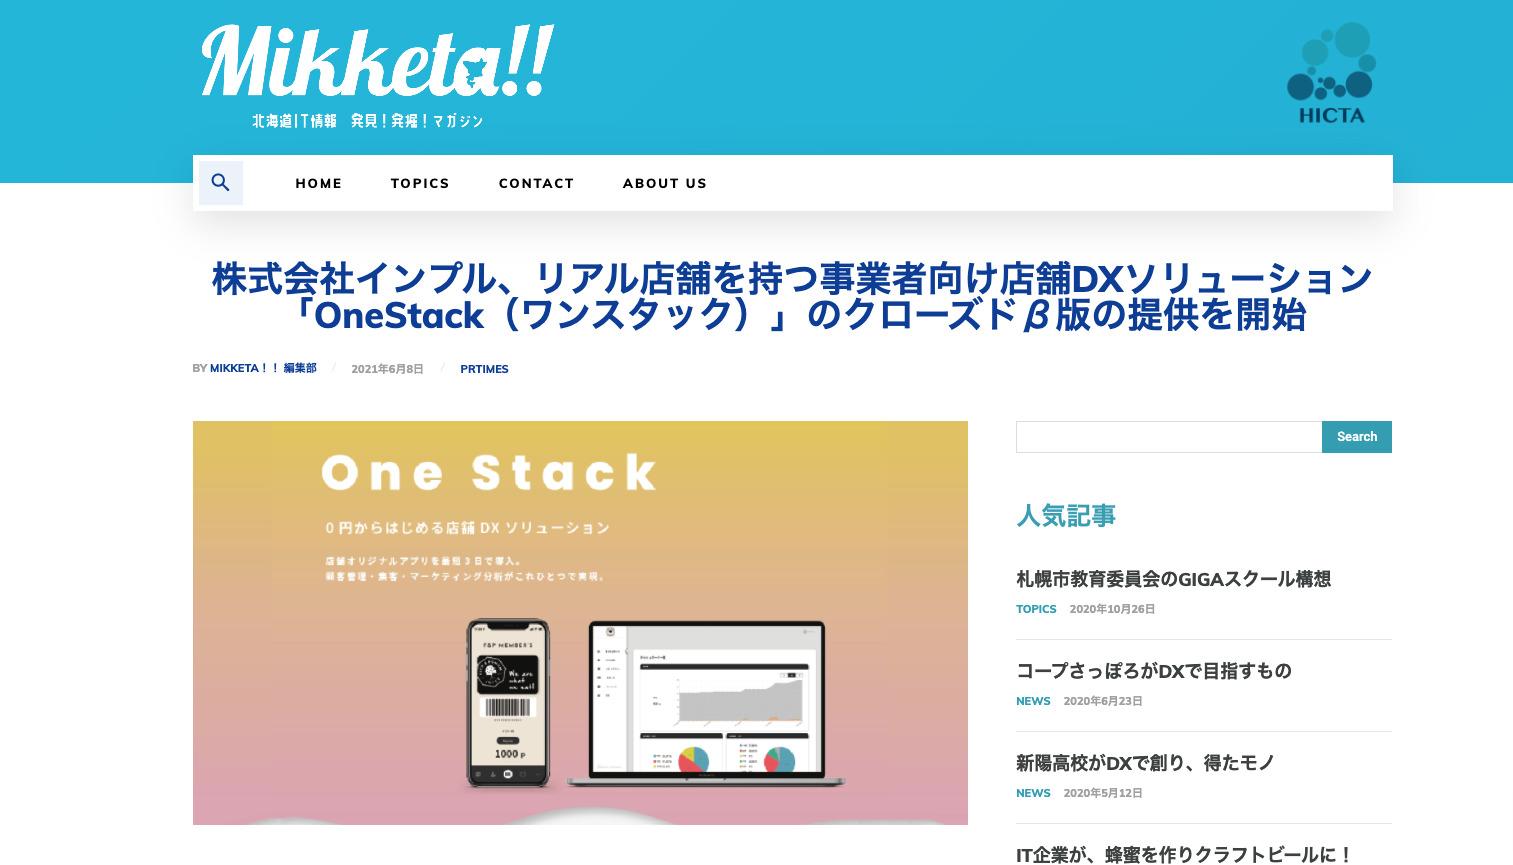 「OneStack」が Mikketa!! に掲載されました